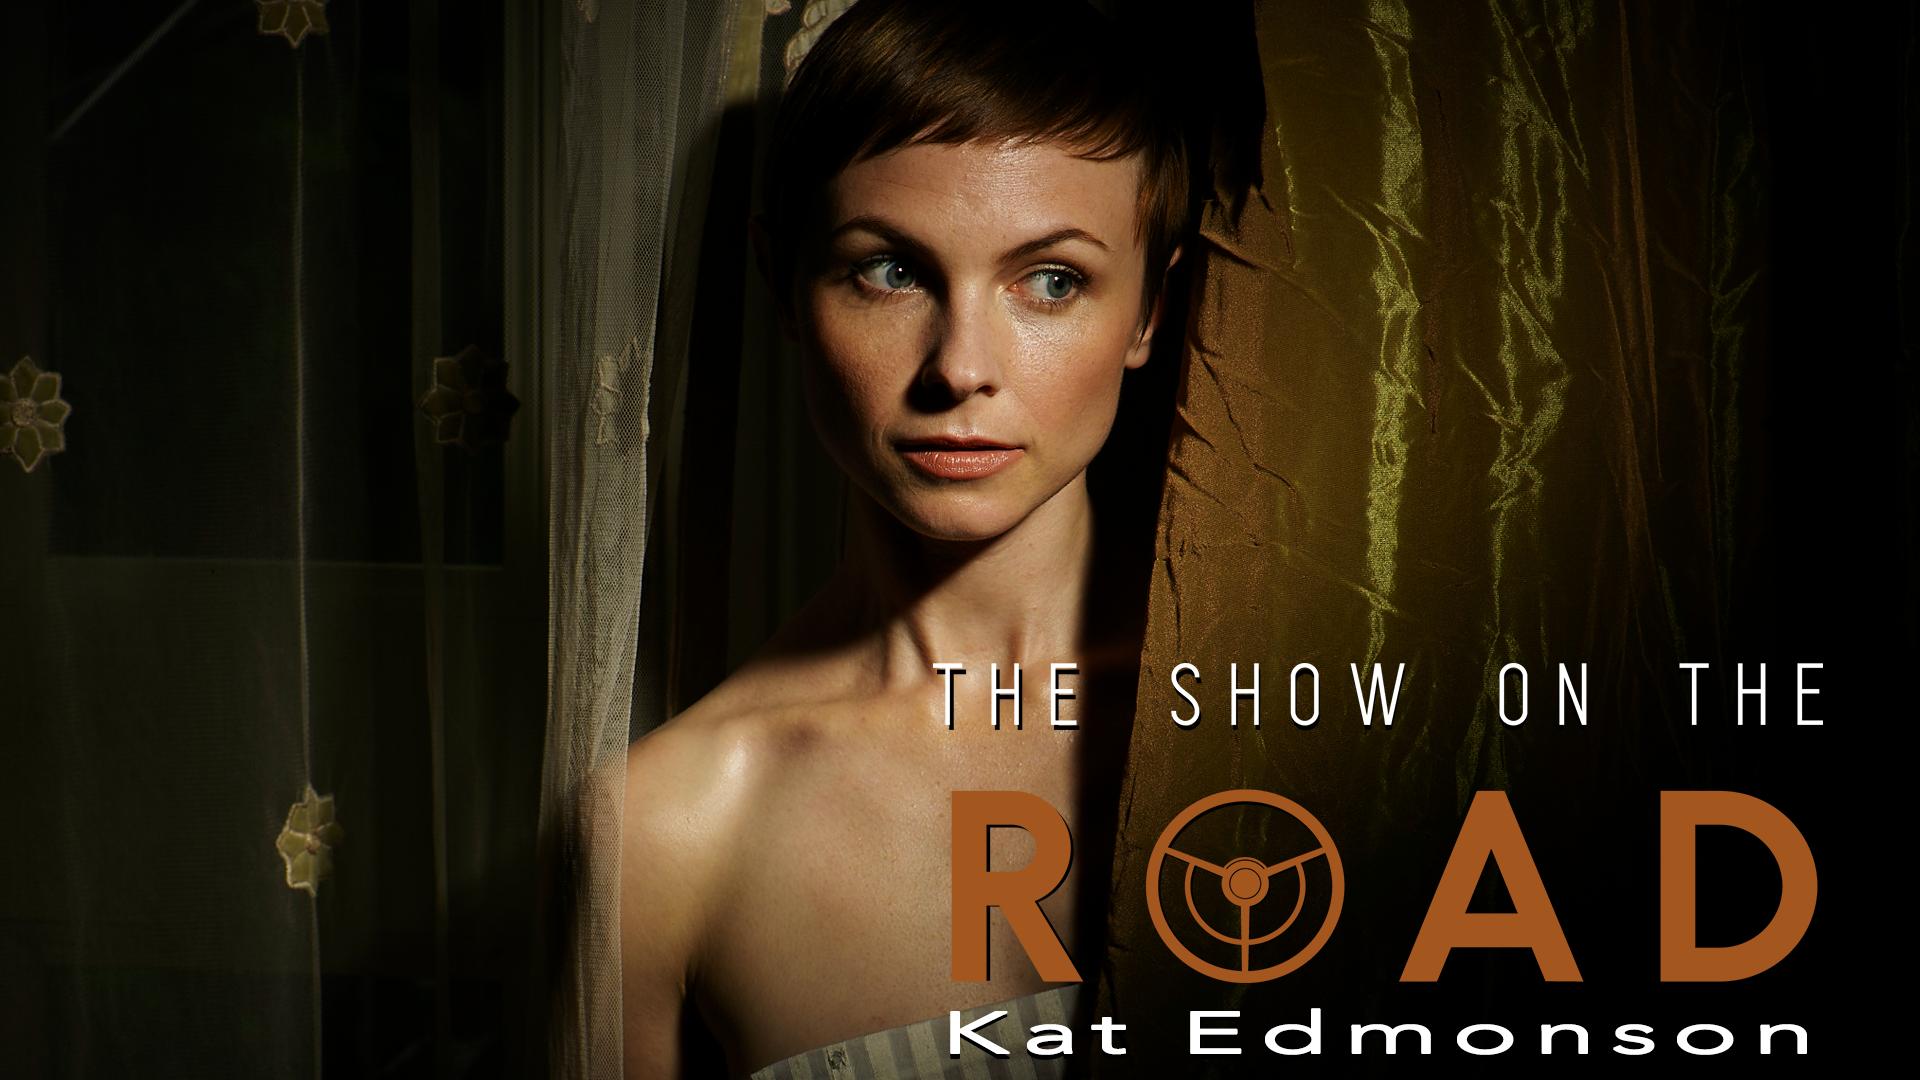 The Show On The Road – Kat Edmonson